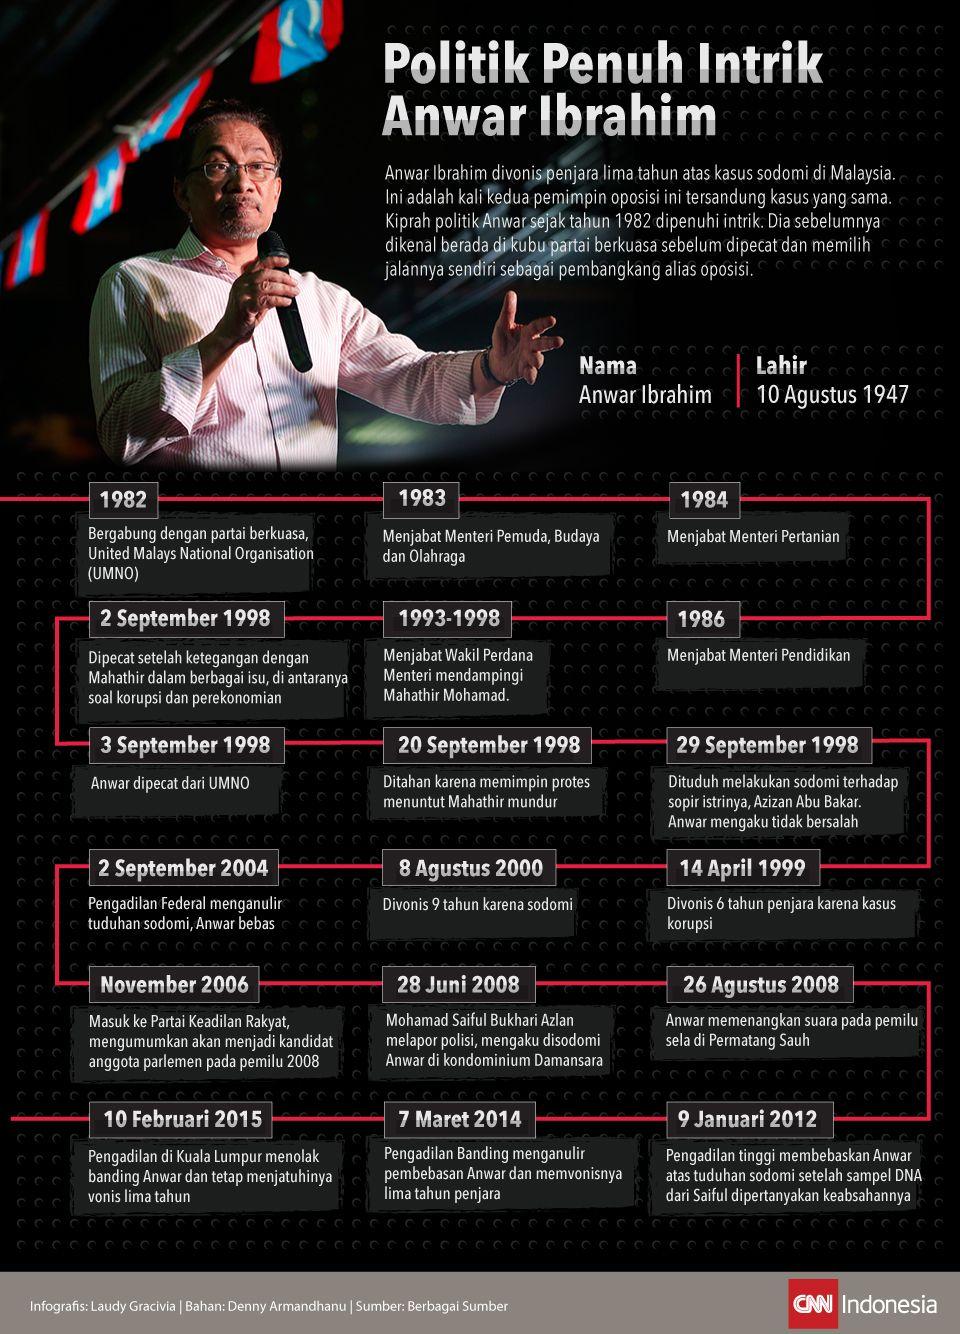 Infografis Politik penuh Intrik Anwar Ibrahim